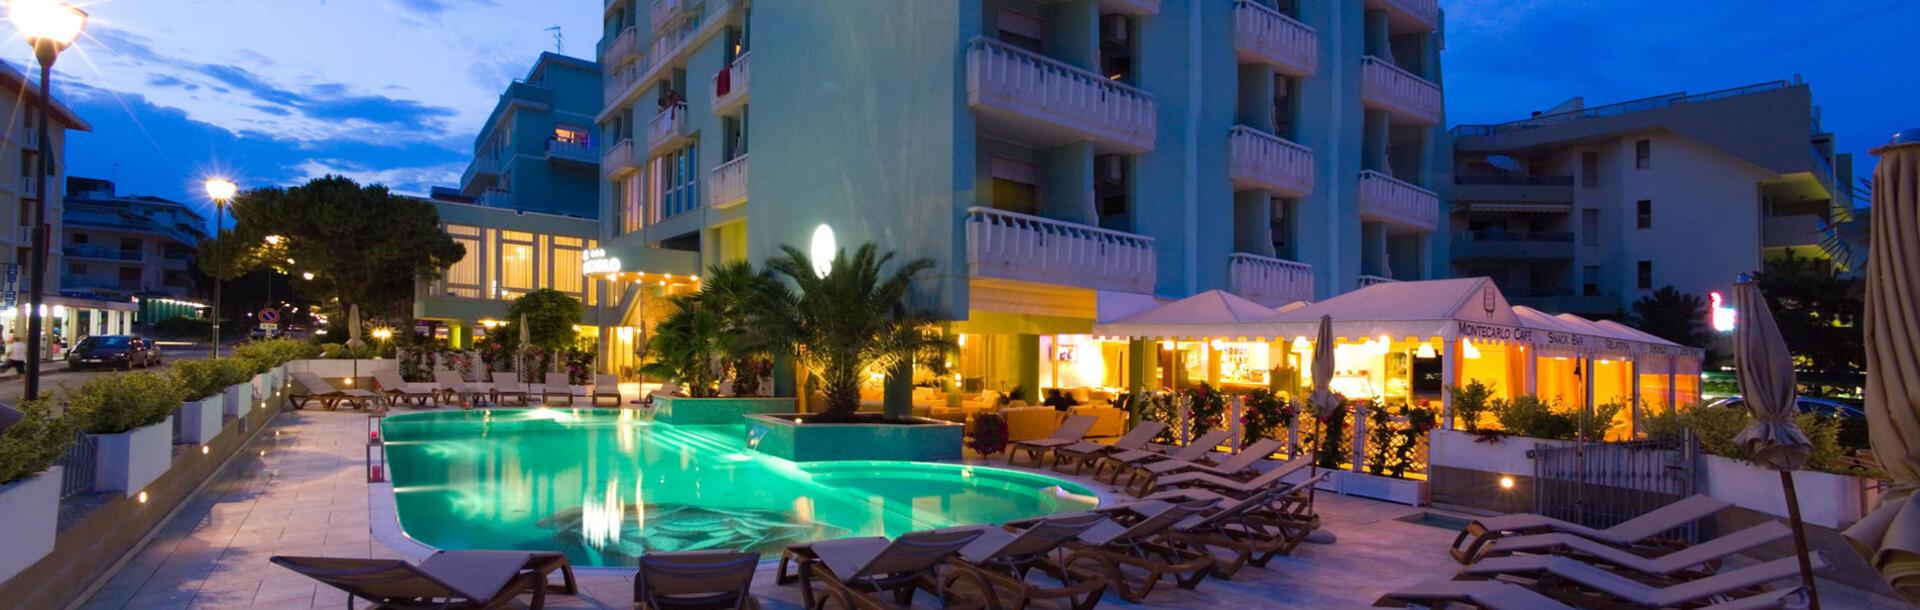 hotel-montecarlo it fotogallery 013